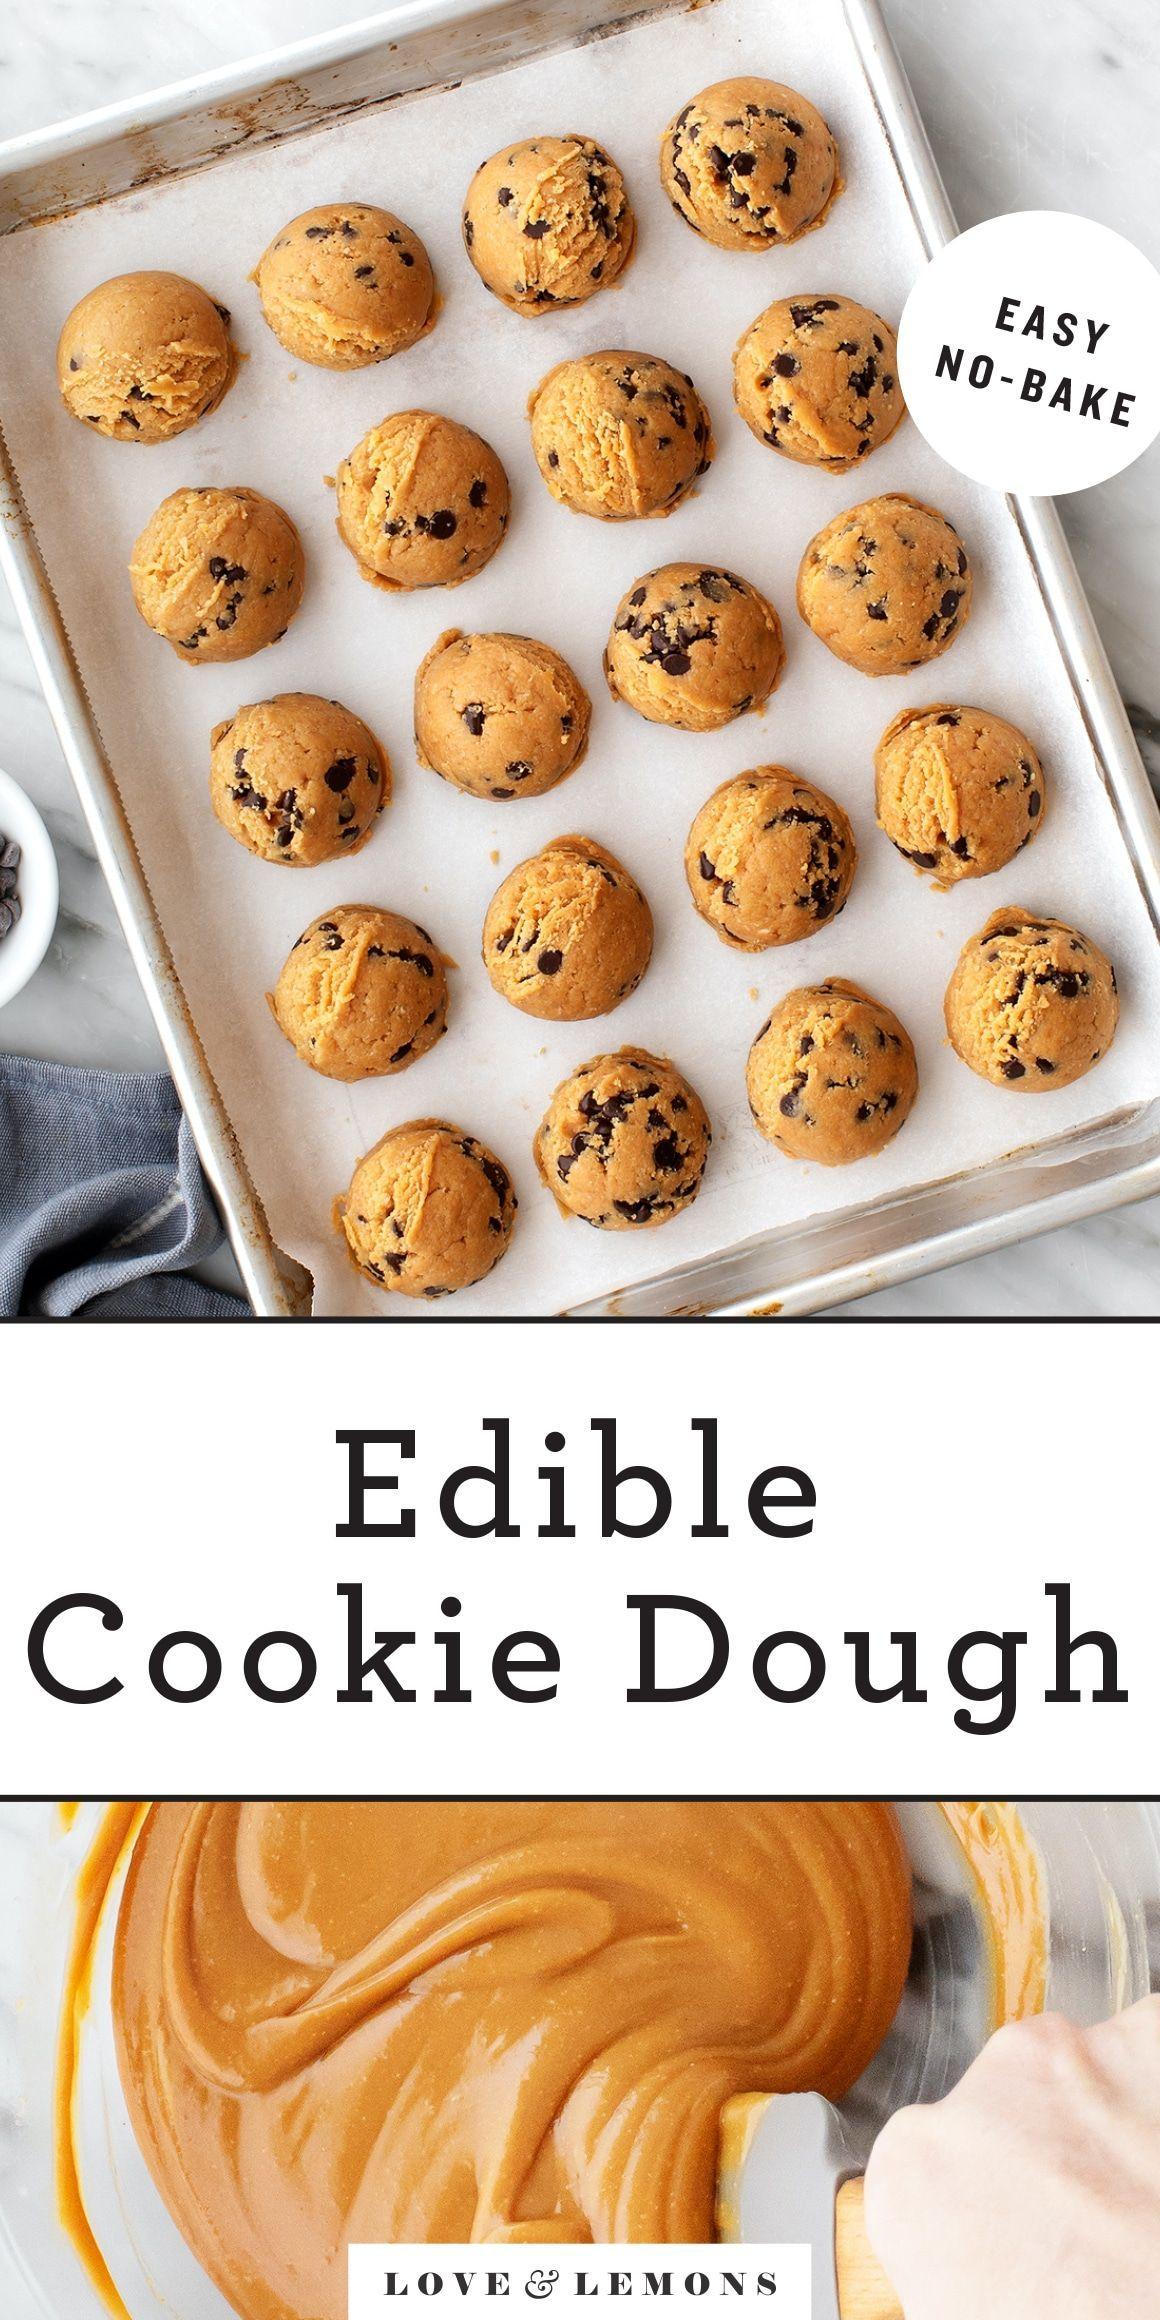 Edible Cookie Dough Recipe Love And Lemons Recipe Edible Cookie Dough Cookie Dough Edible Cookies